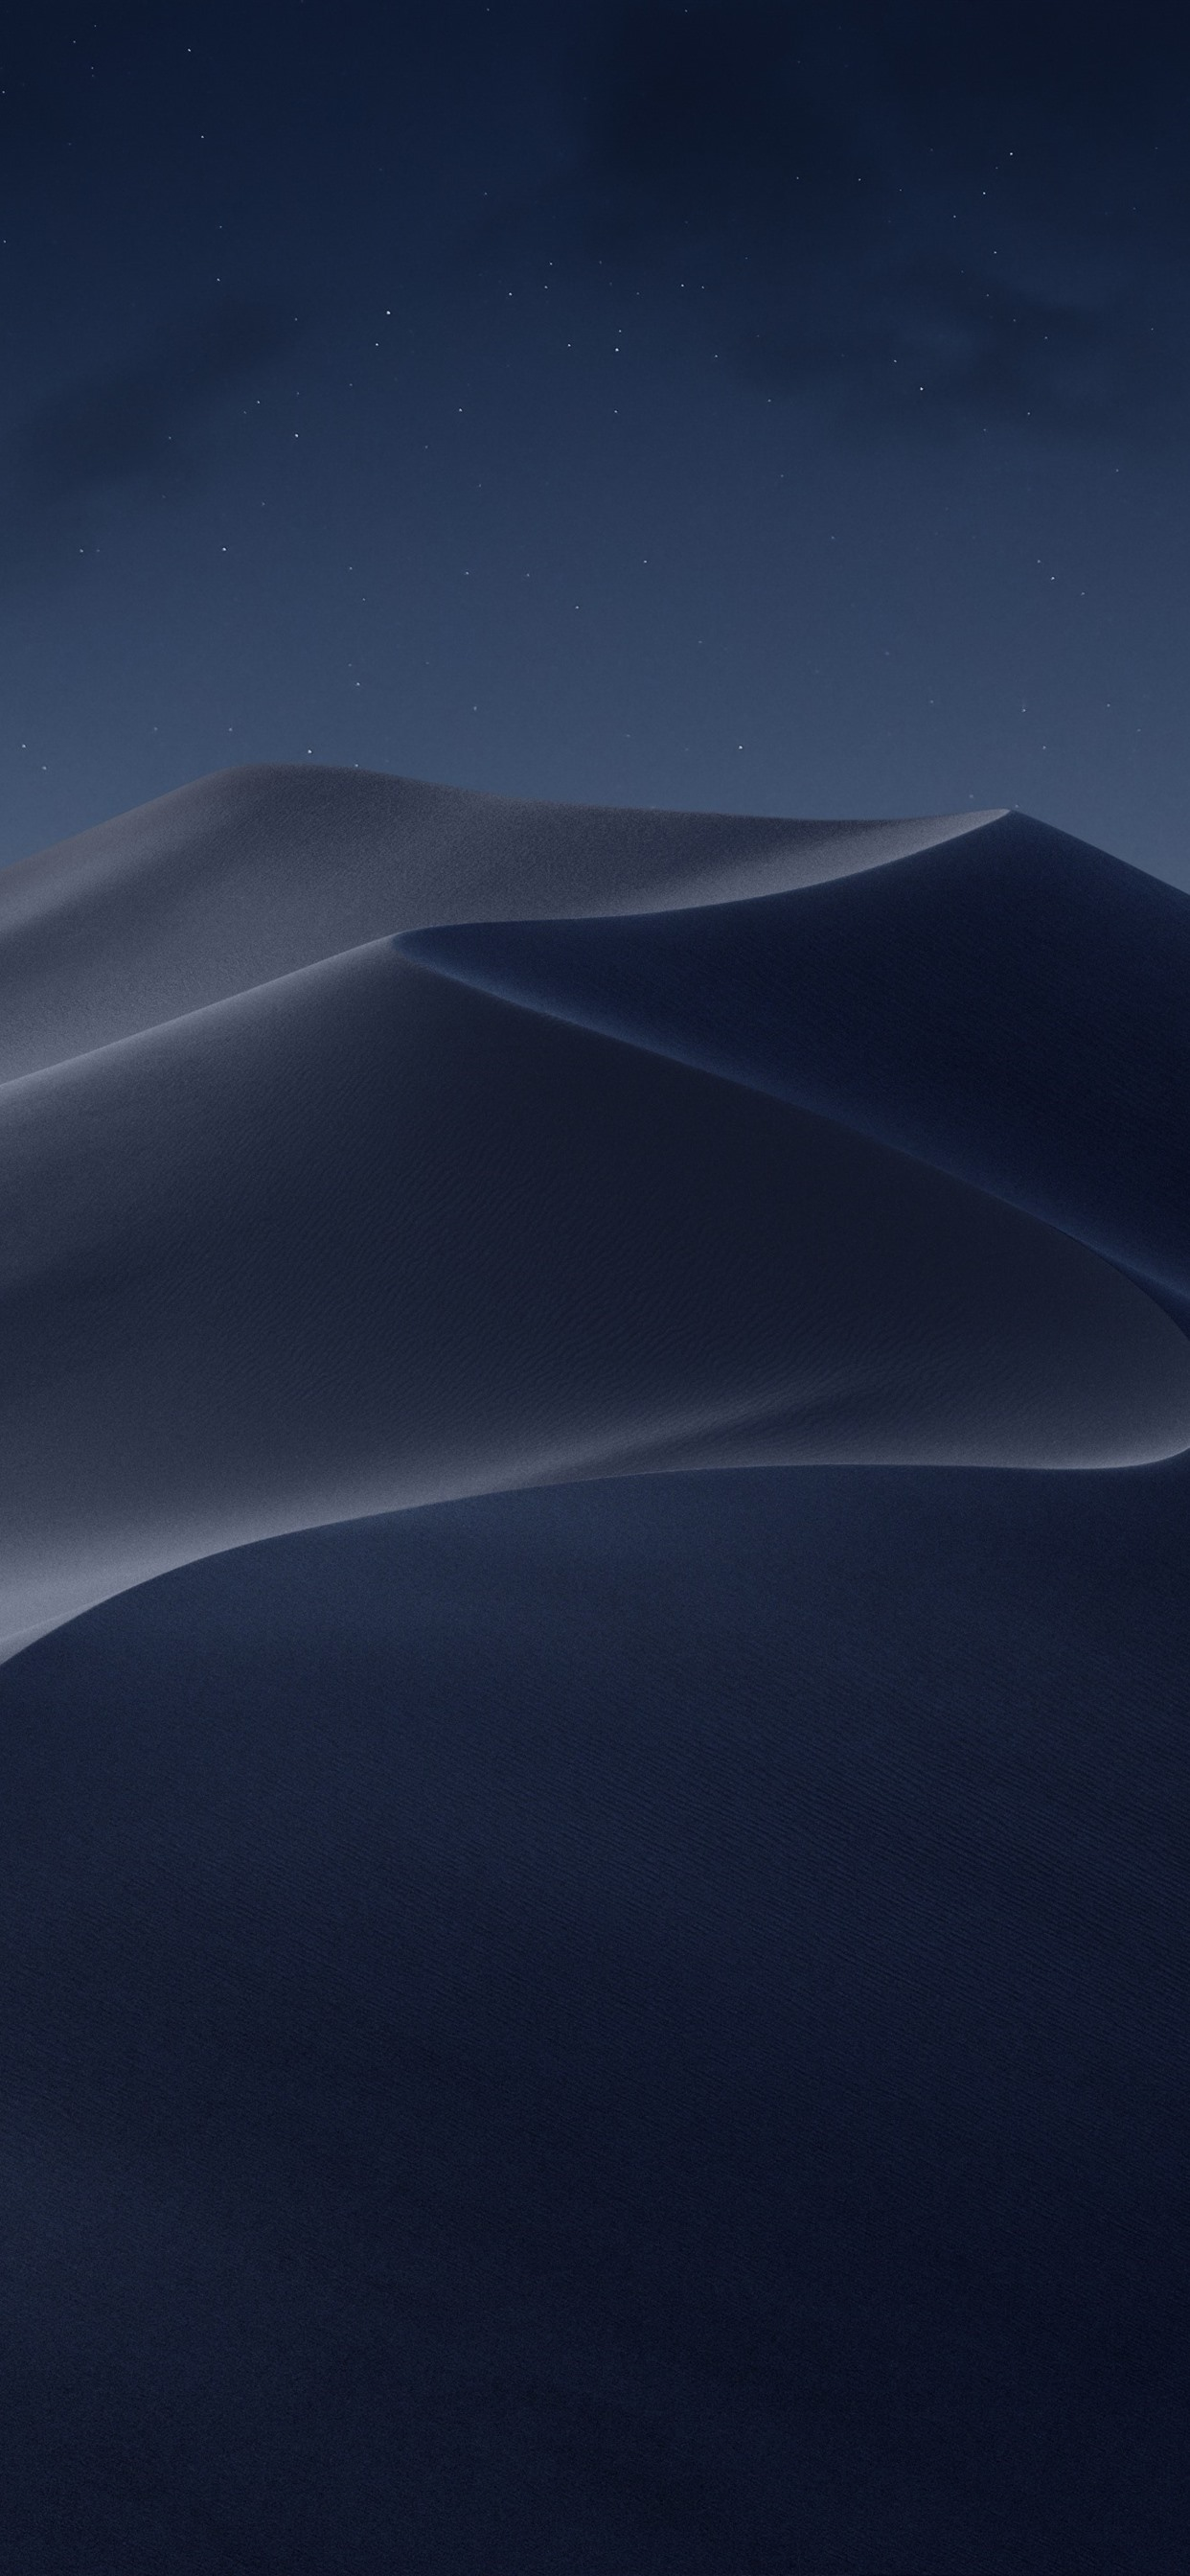 Mojave Desert Dune Night Stars 1242x2688 Iphone 11 Pro Xs Max Wallpaper Background Picture Image